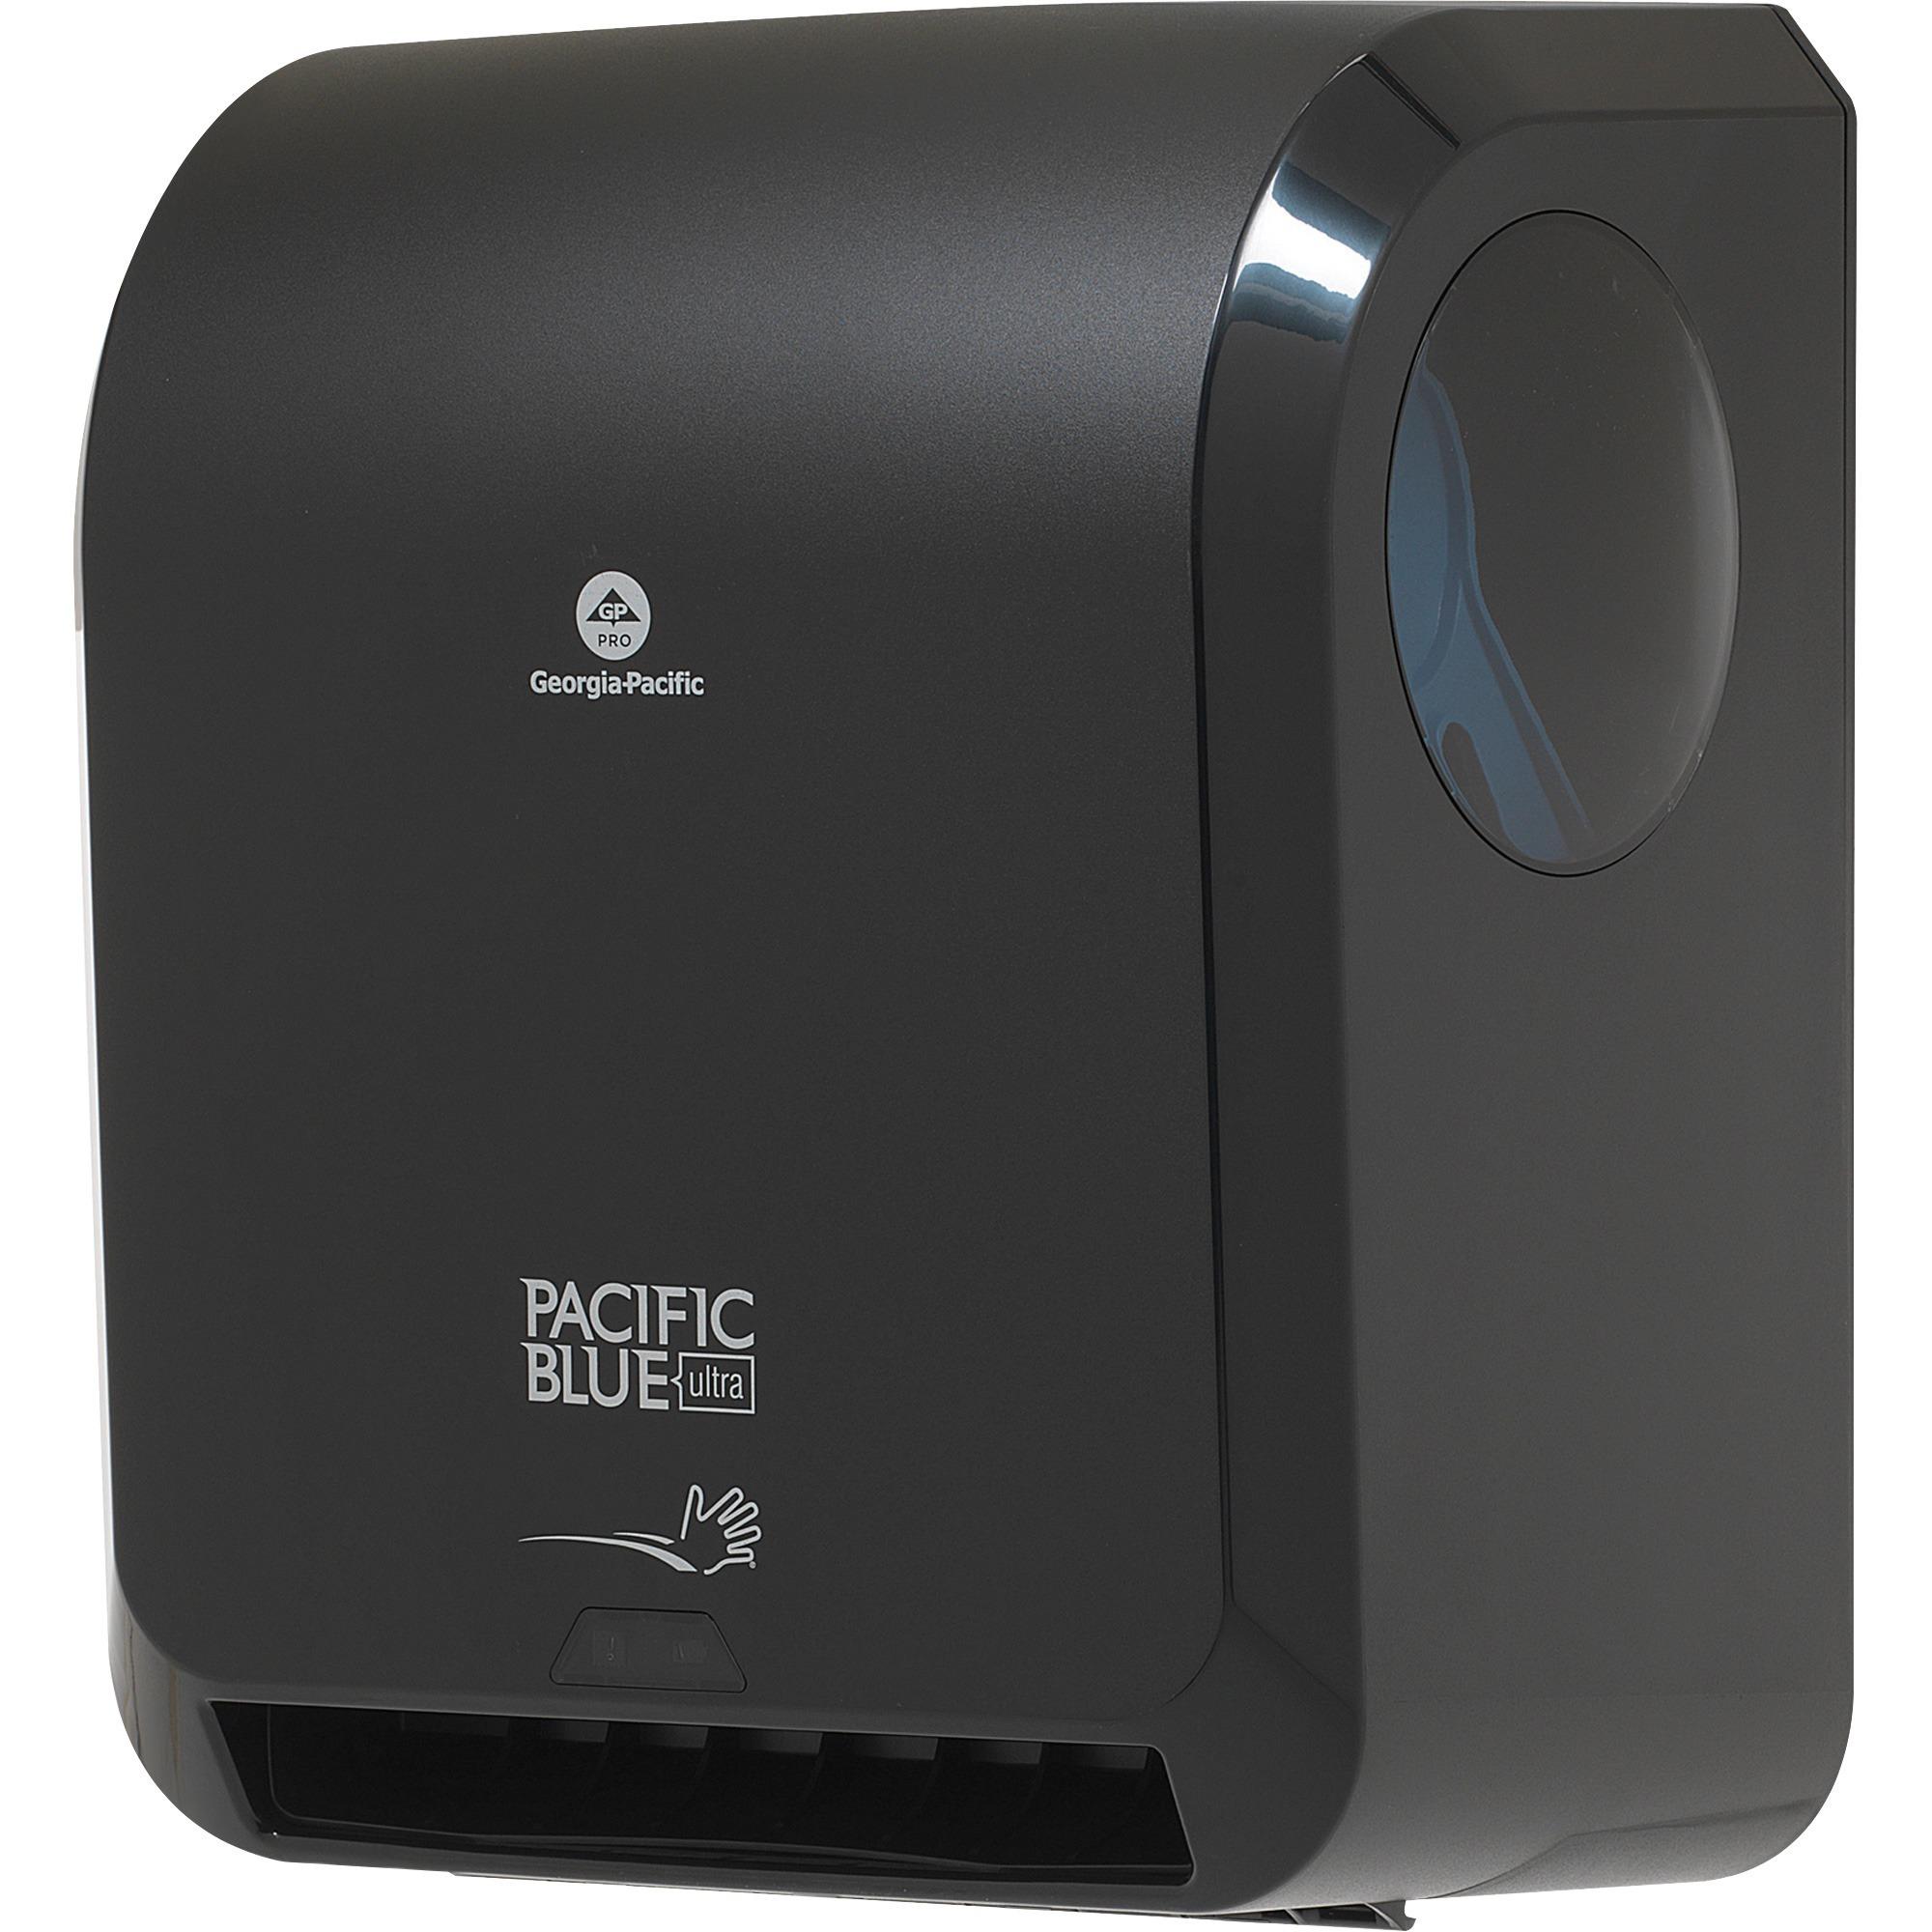 Georgia-Pacific Pacific Blue Ultra Automated Paper Towel Dispenser, 59590, 12.9 x 9 x 16.8, Black